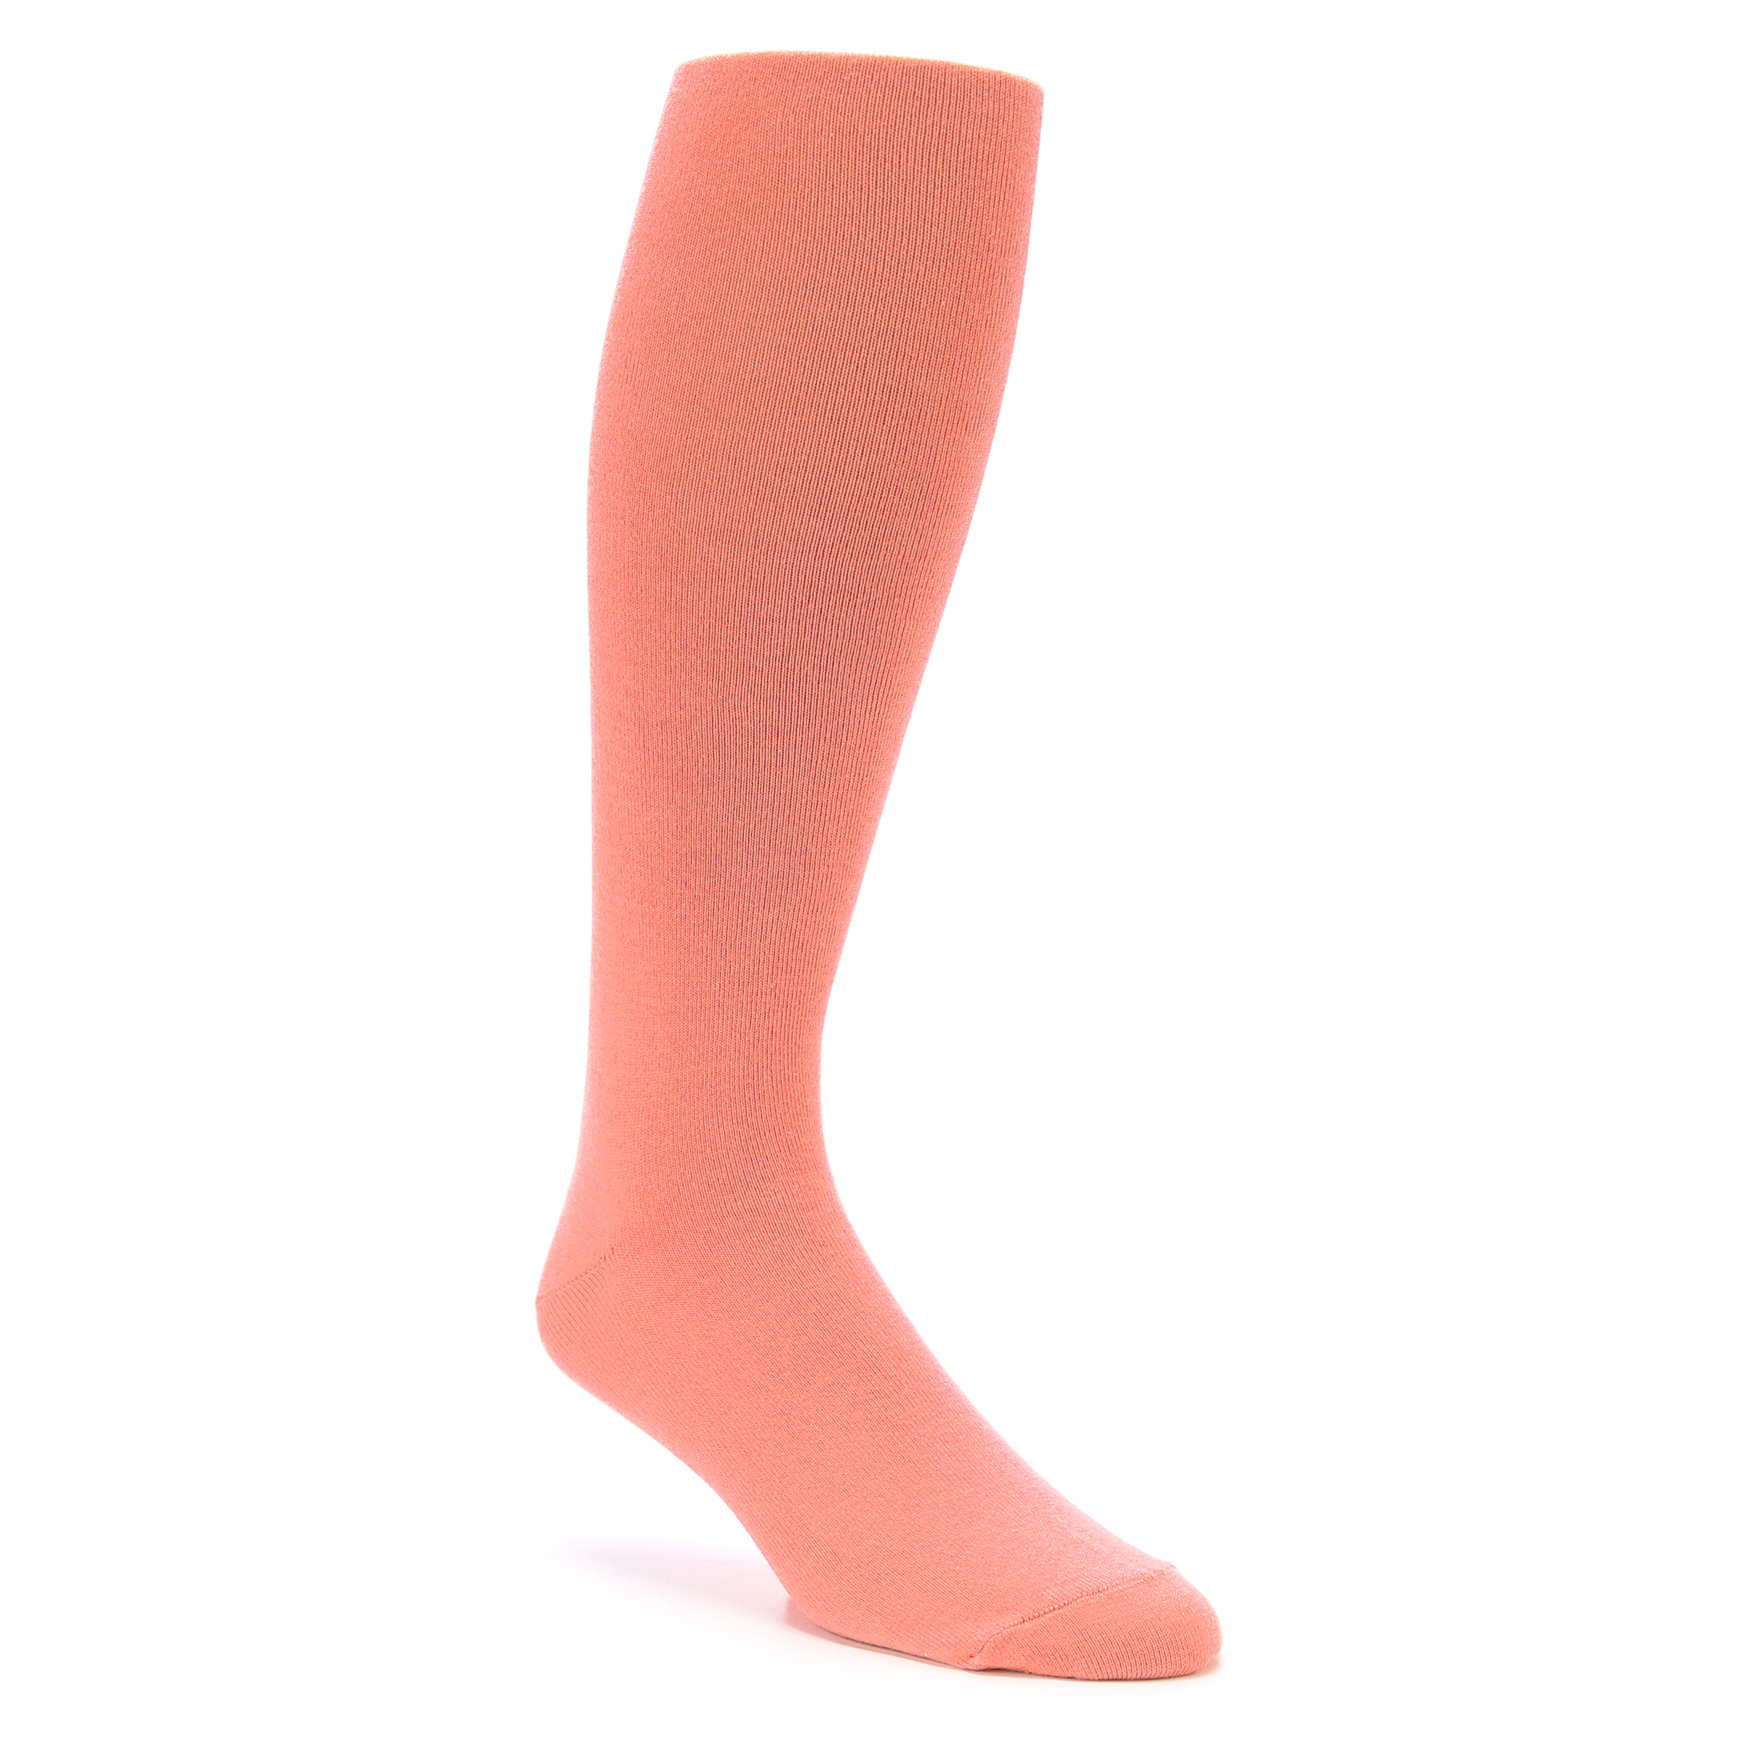 Men&39s Pink Socks – boldSOCKS